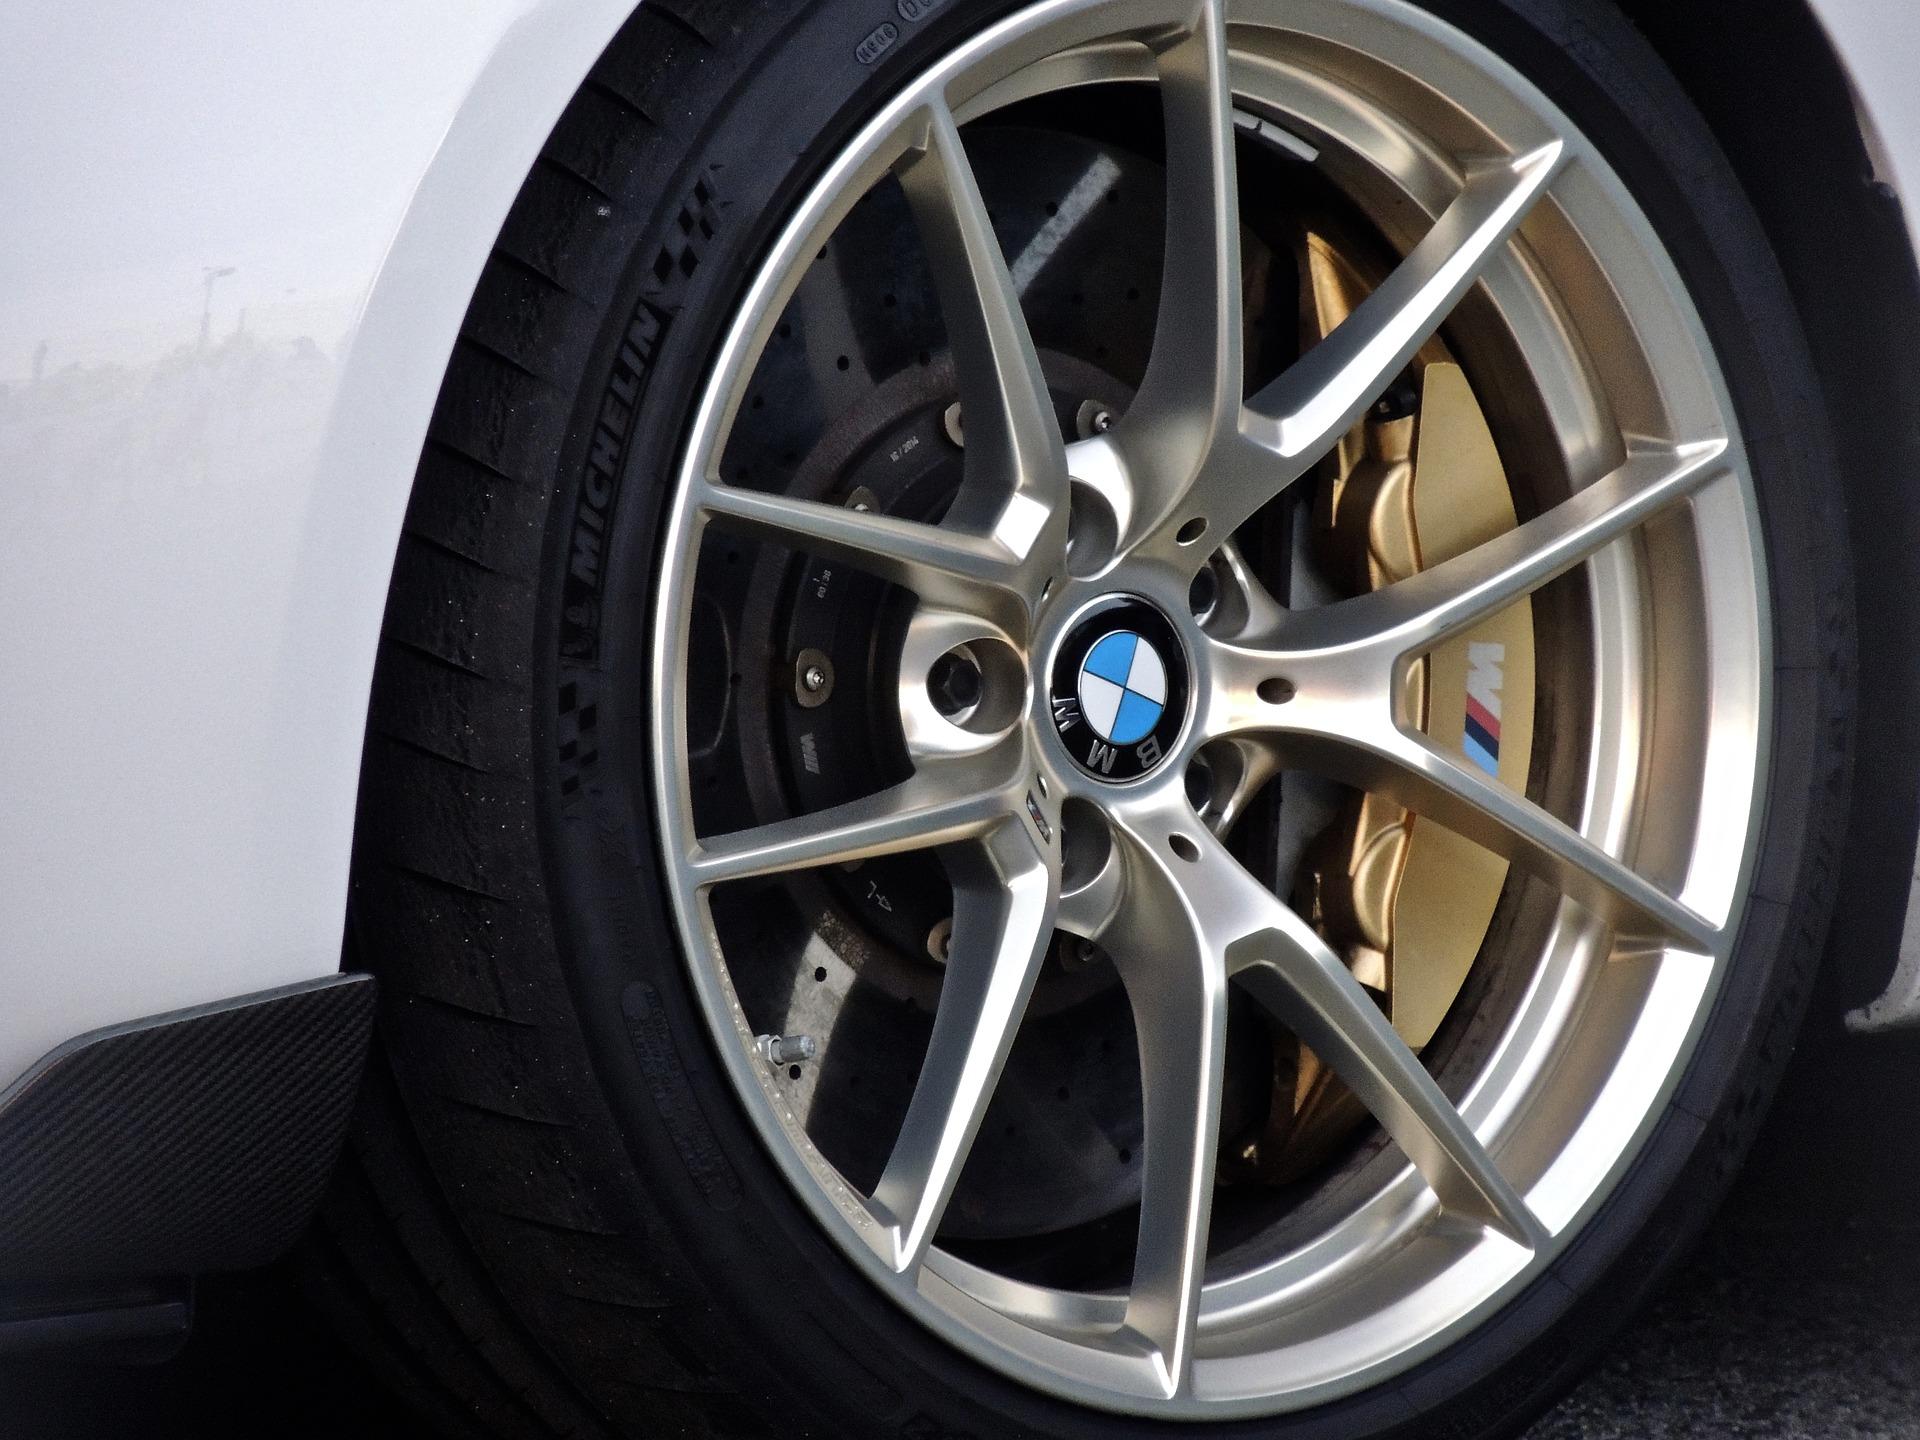 Comment choisir son pneu Michelin?